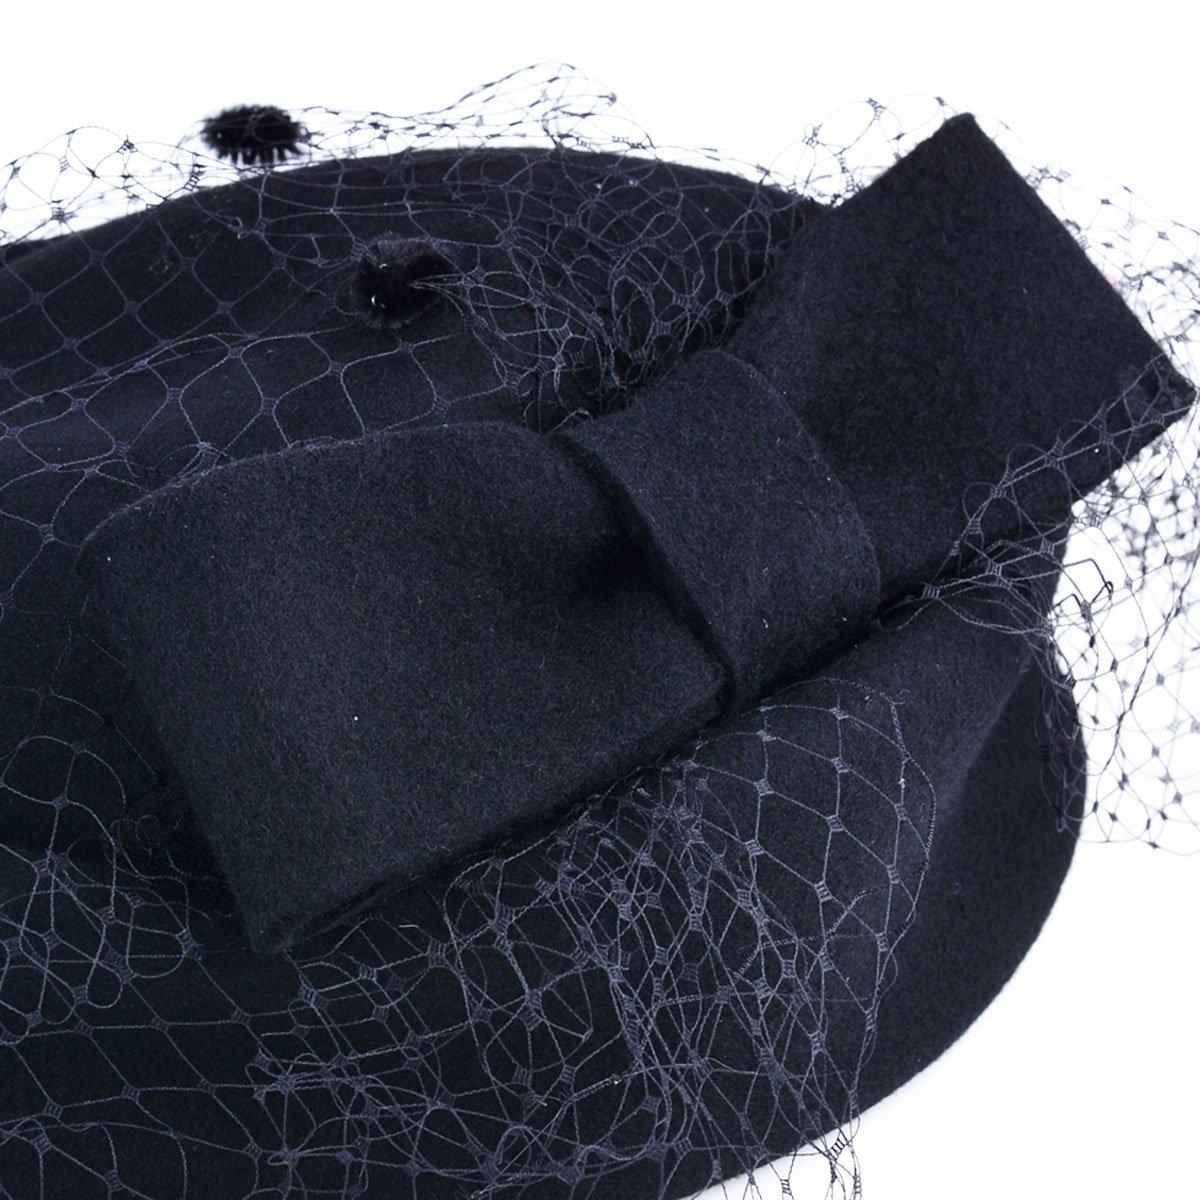 Fascigirl Pillbox Hat Veil Fascinator Party Wedding Retro Top Hat for Women